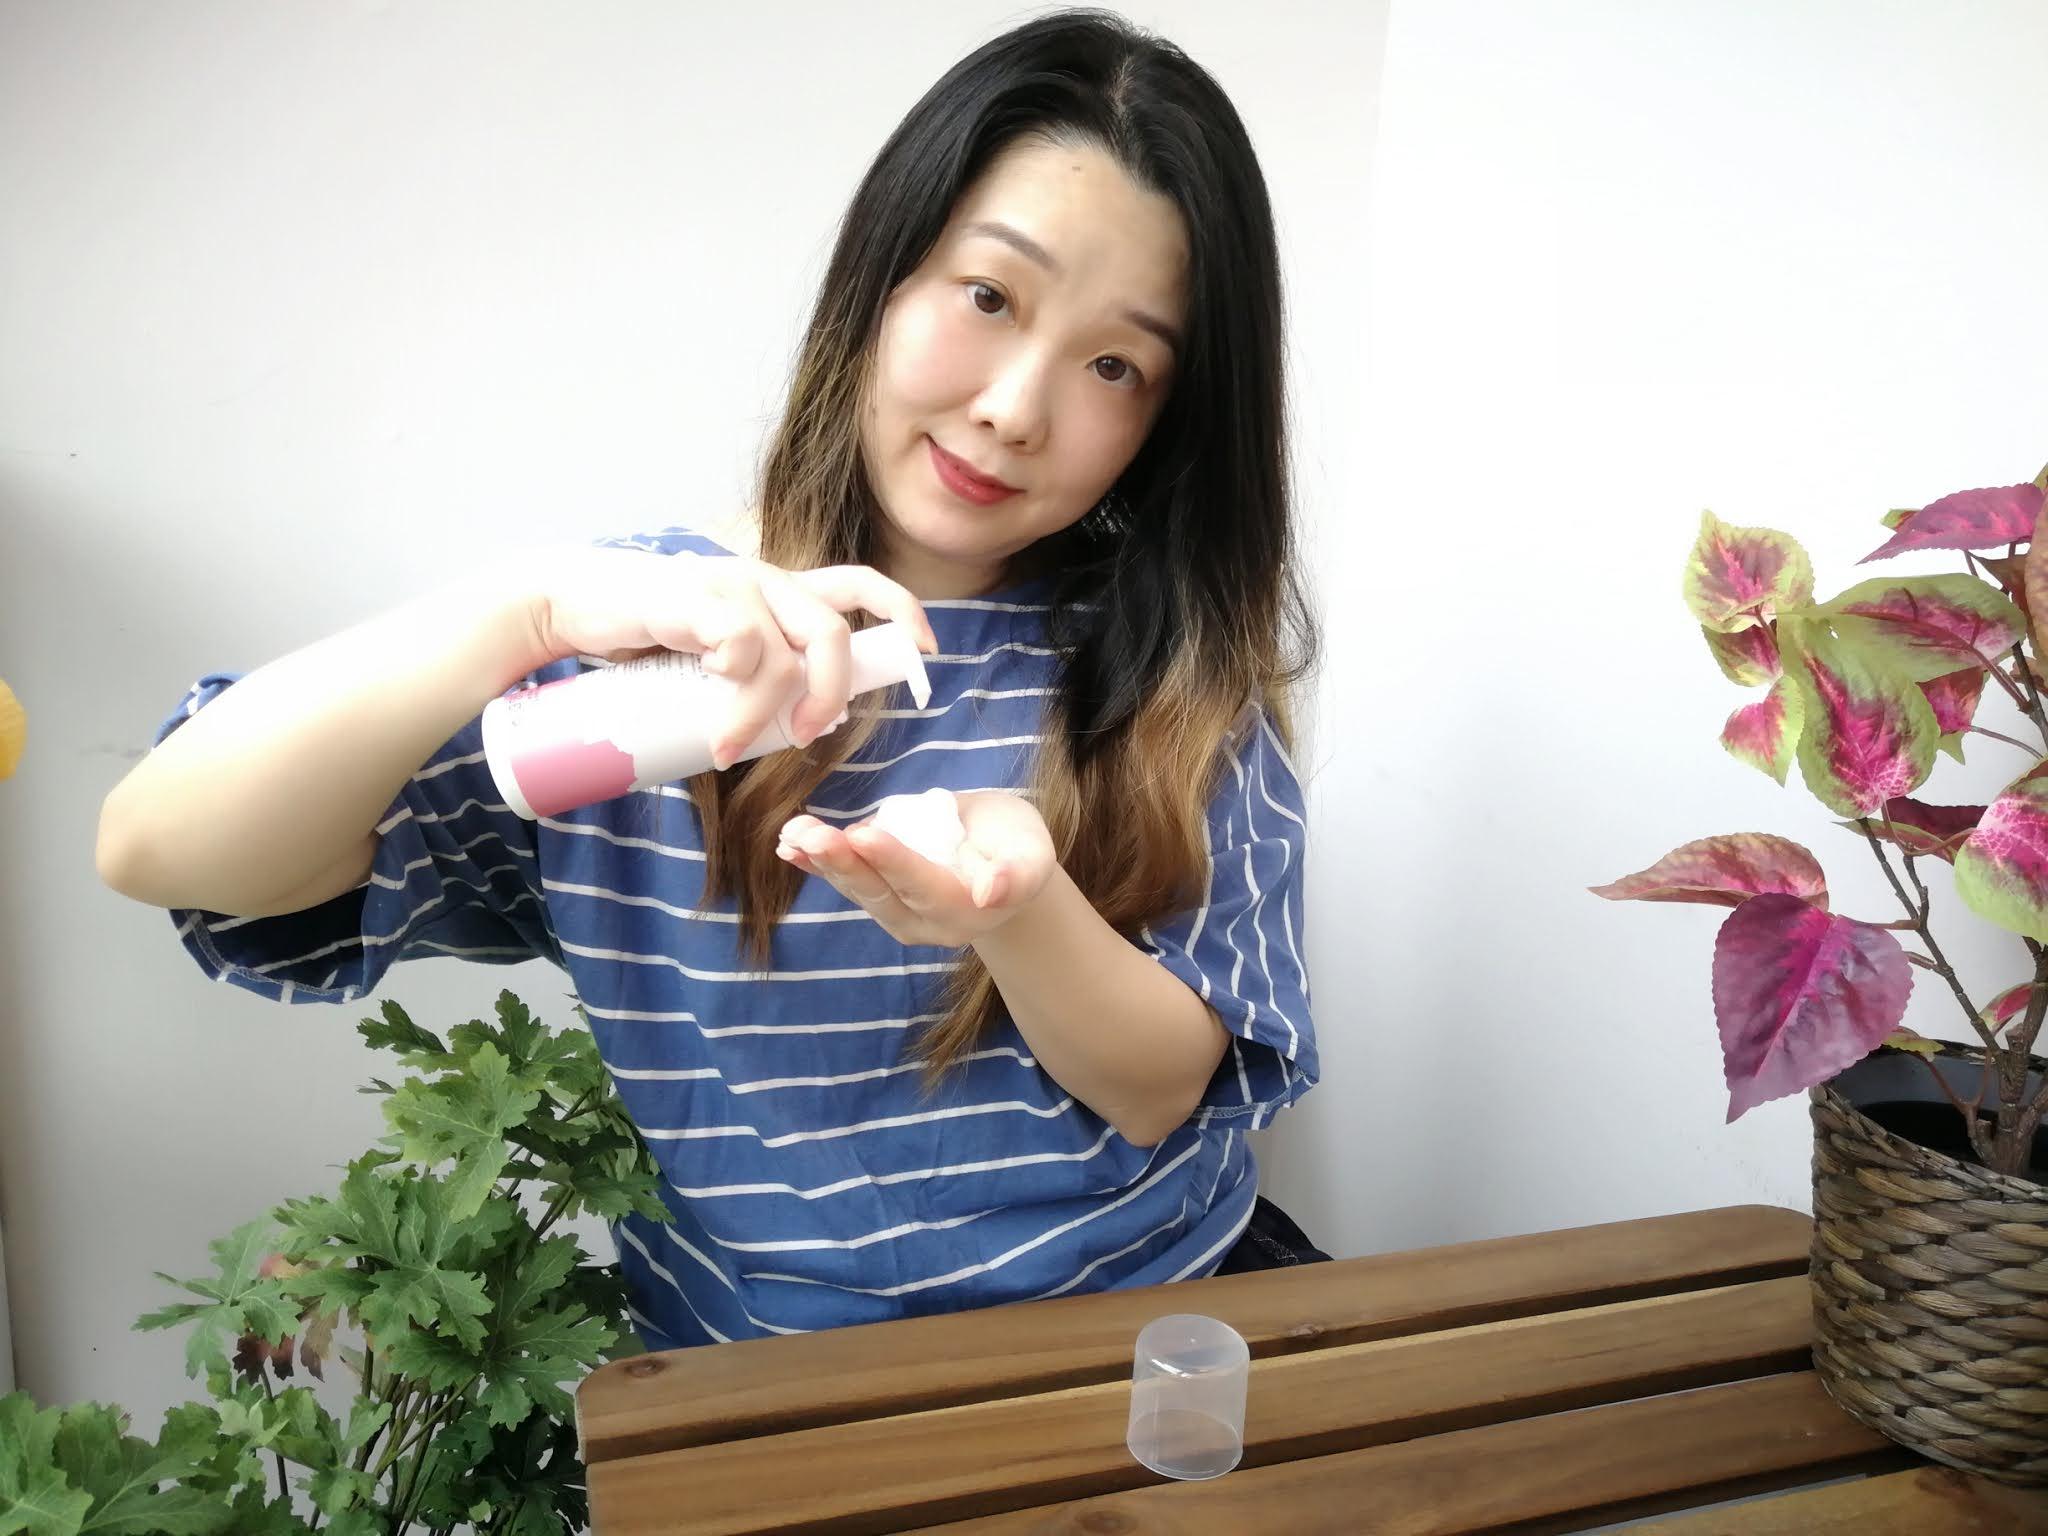 BeautySearch MyLife Blog: 卸潔保濕 一瓶三效 .。 ॢ₀《BHK's 潔顏洗卸慕斯》洗出滑嫩Q彈肌